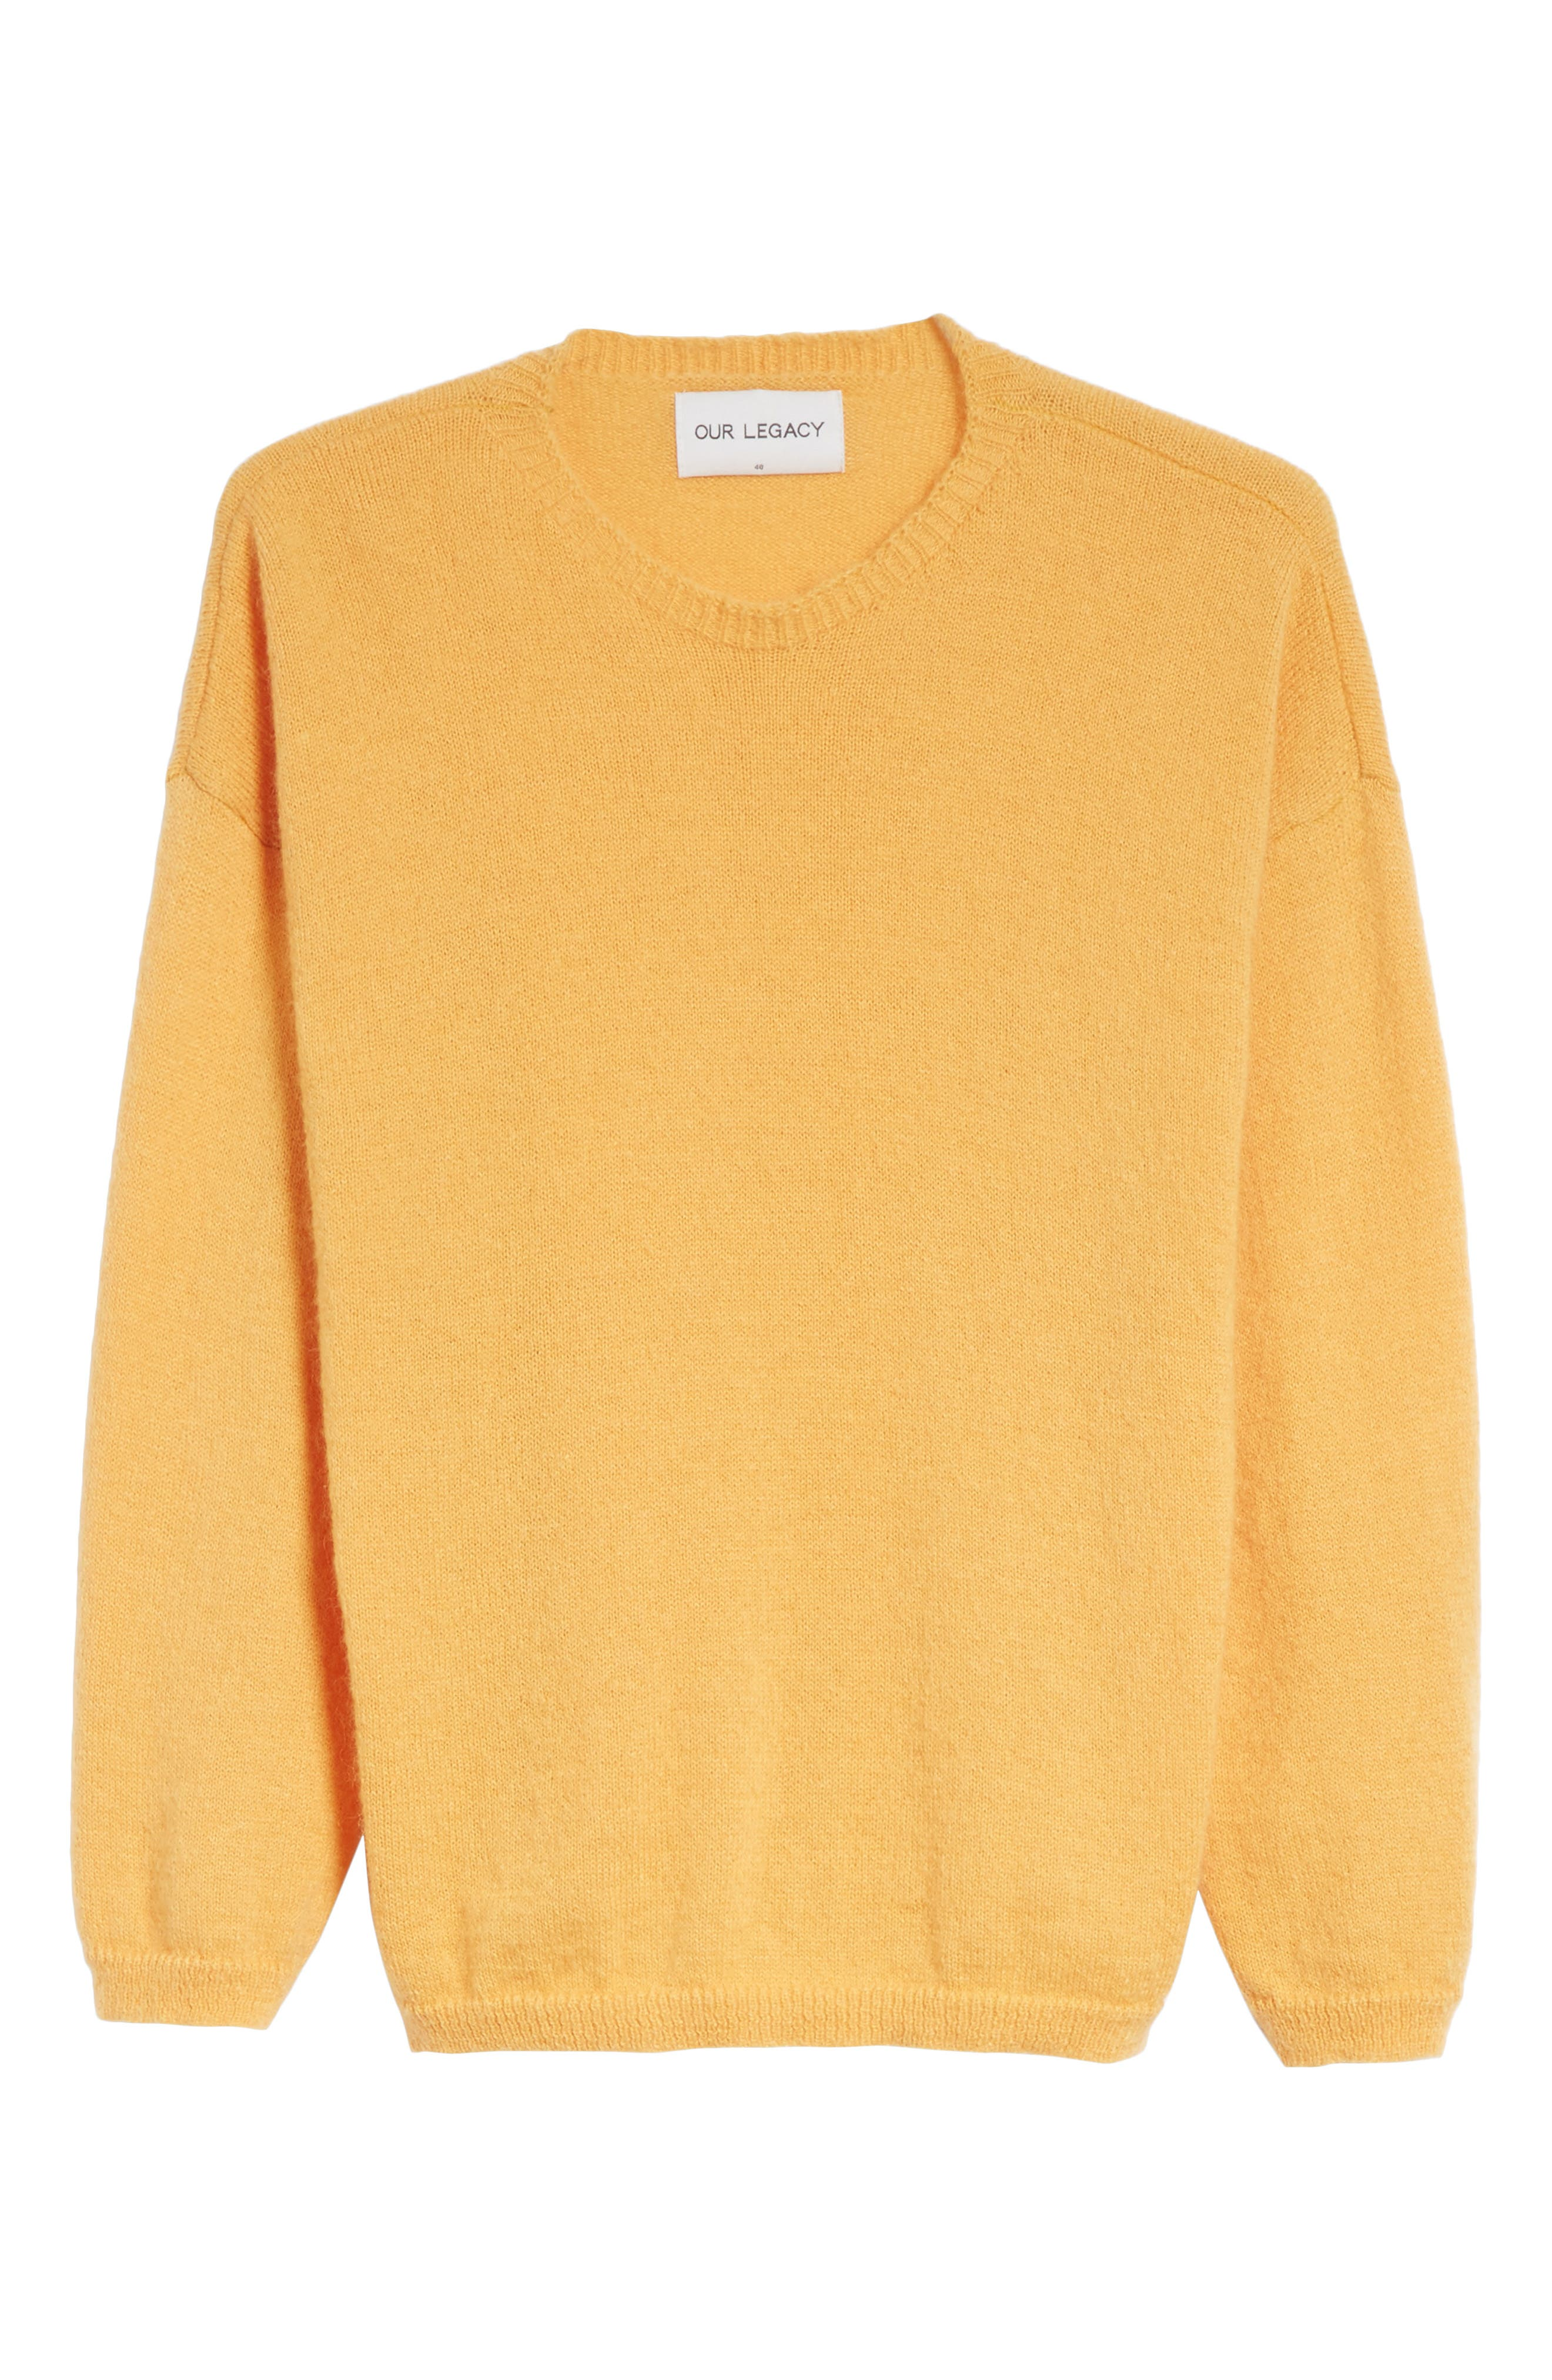 Mohair Blend Crewneck Sweater,                             Alternate thumbnail 6, color,